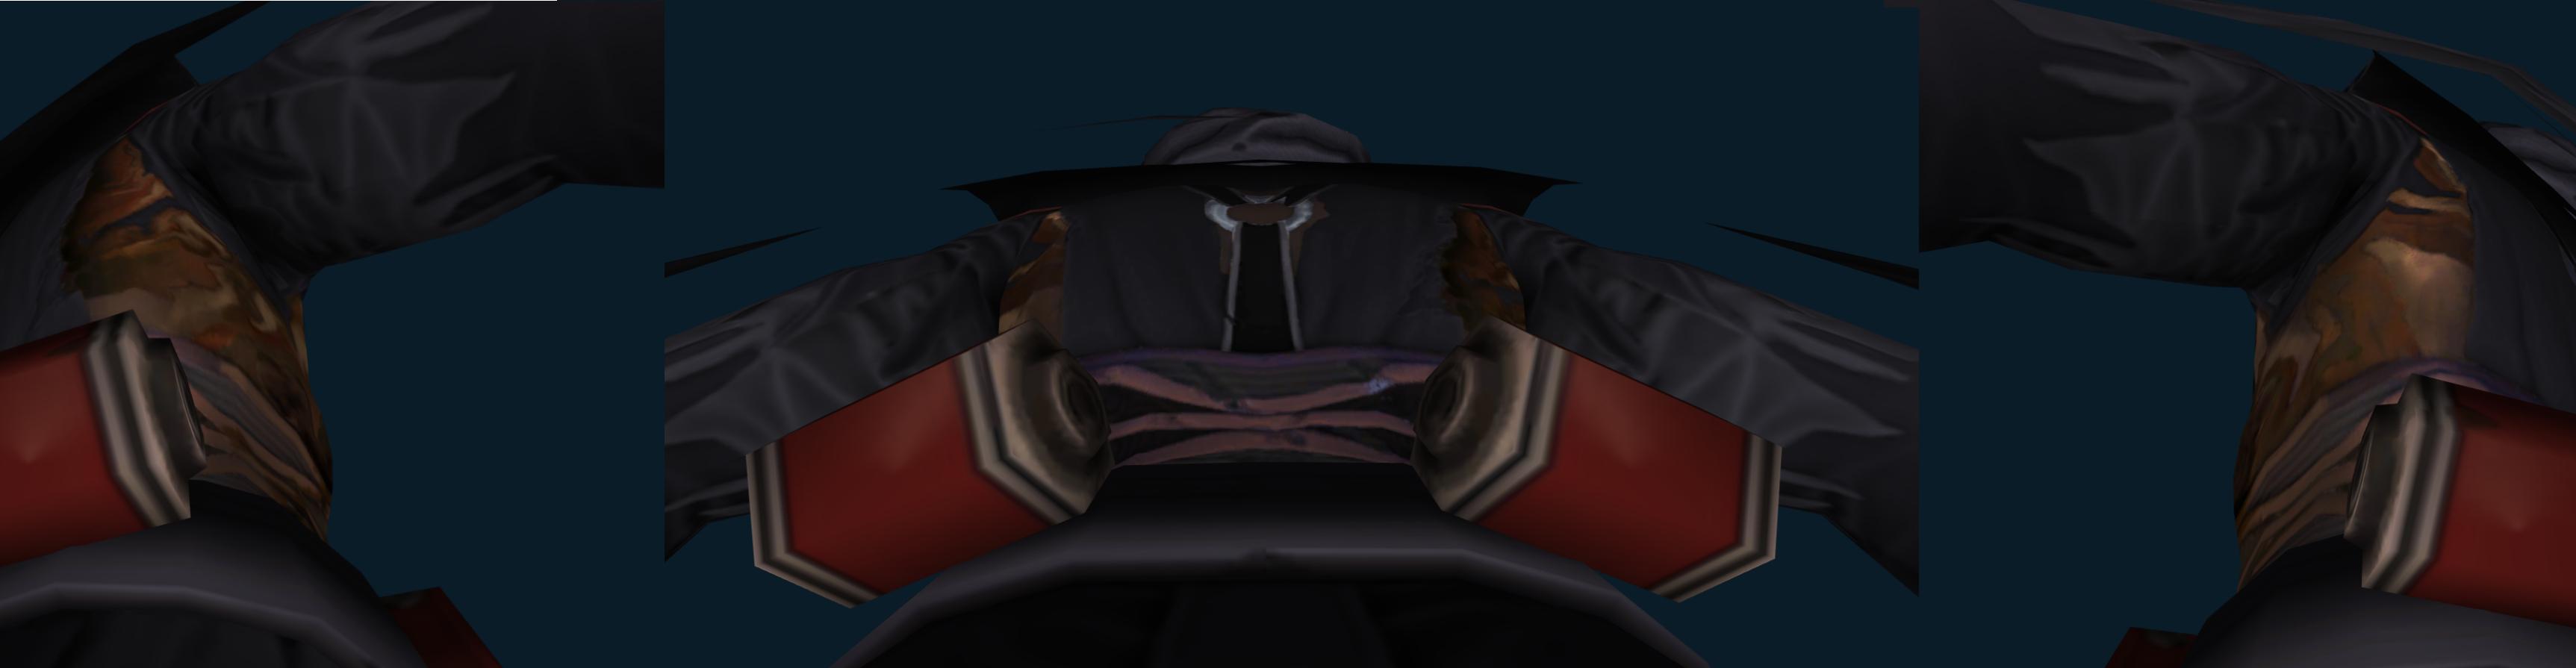 Swtor-SoR-upperarm-profile1.jpg